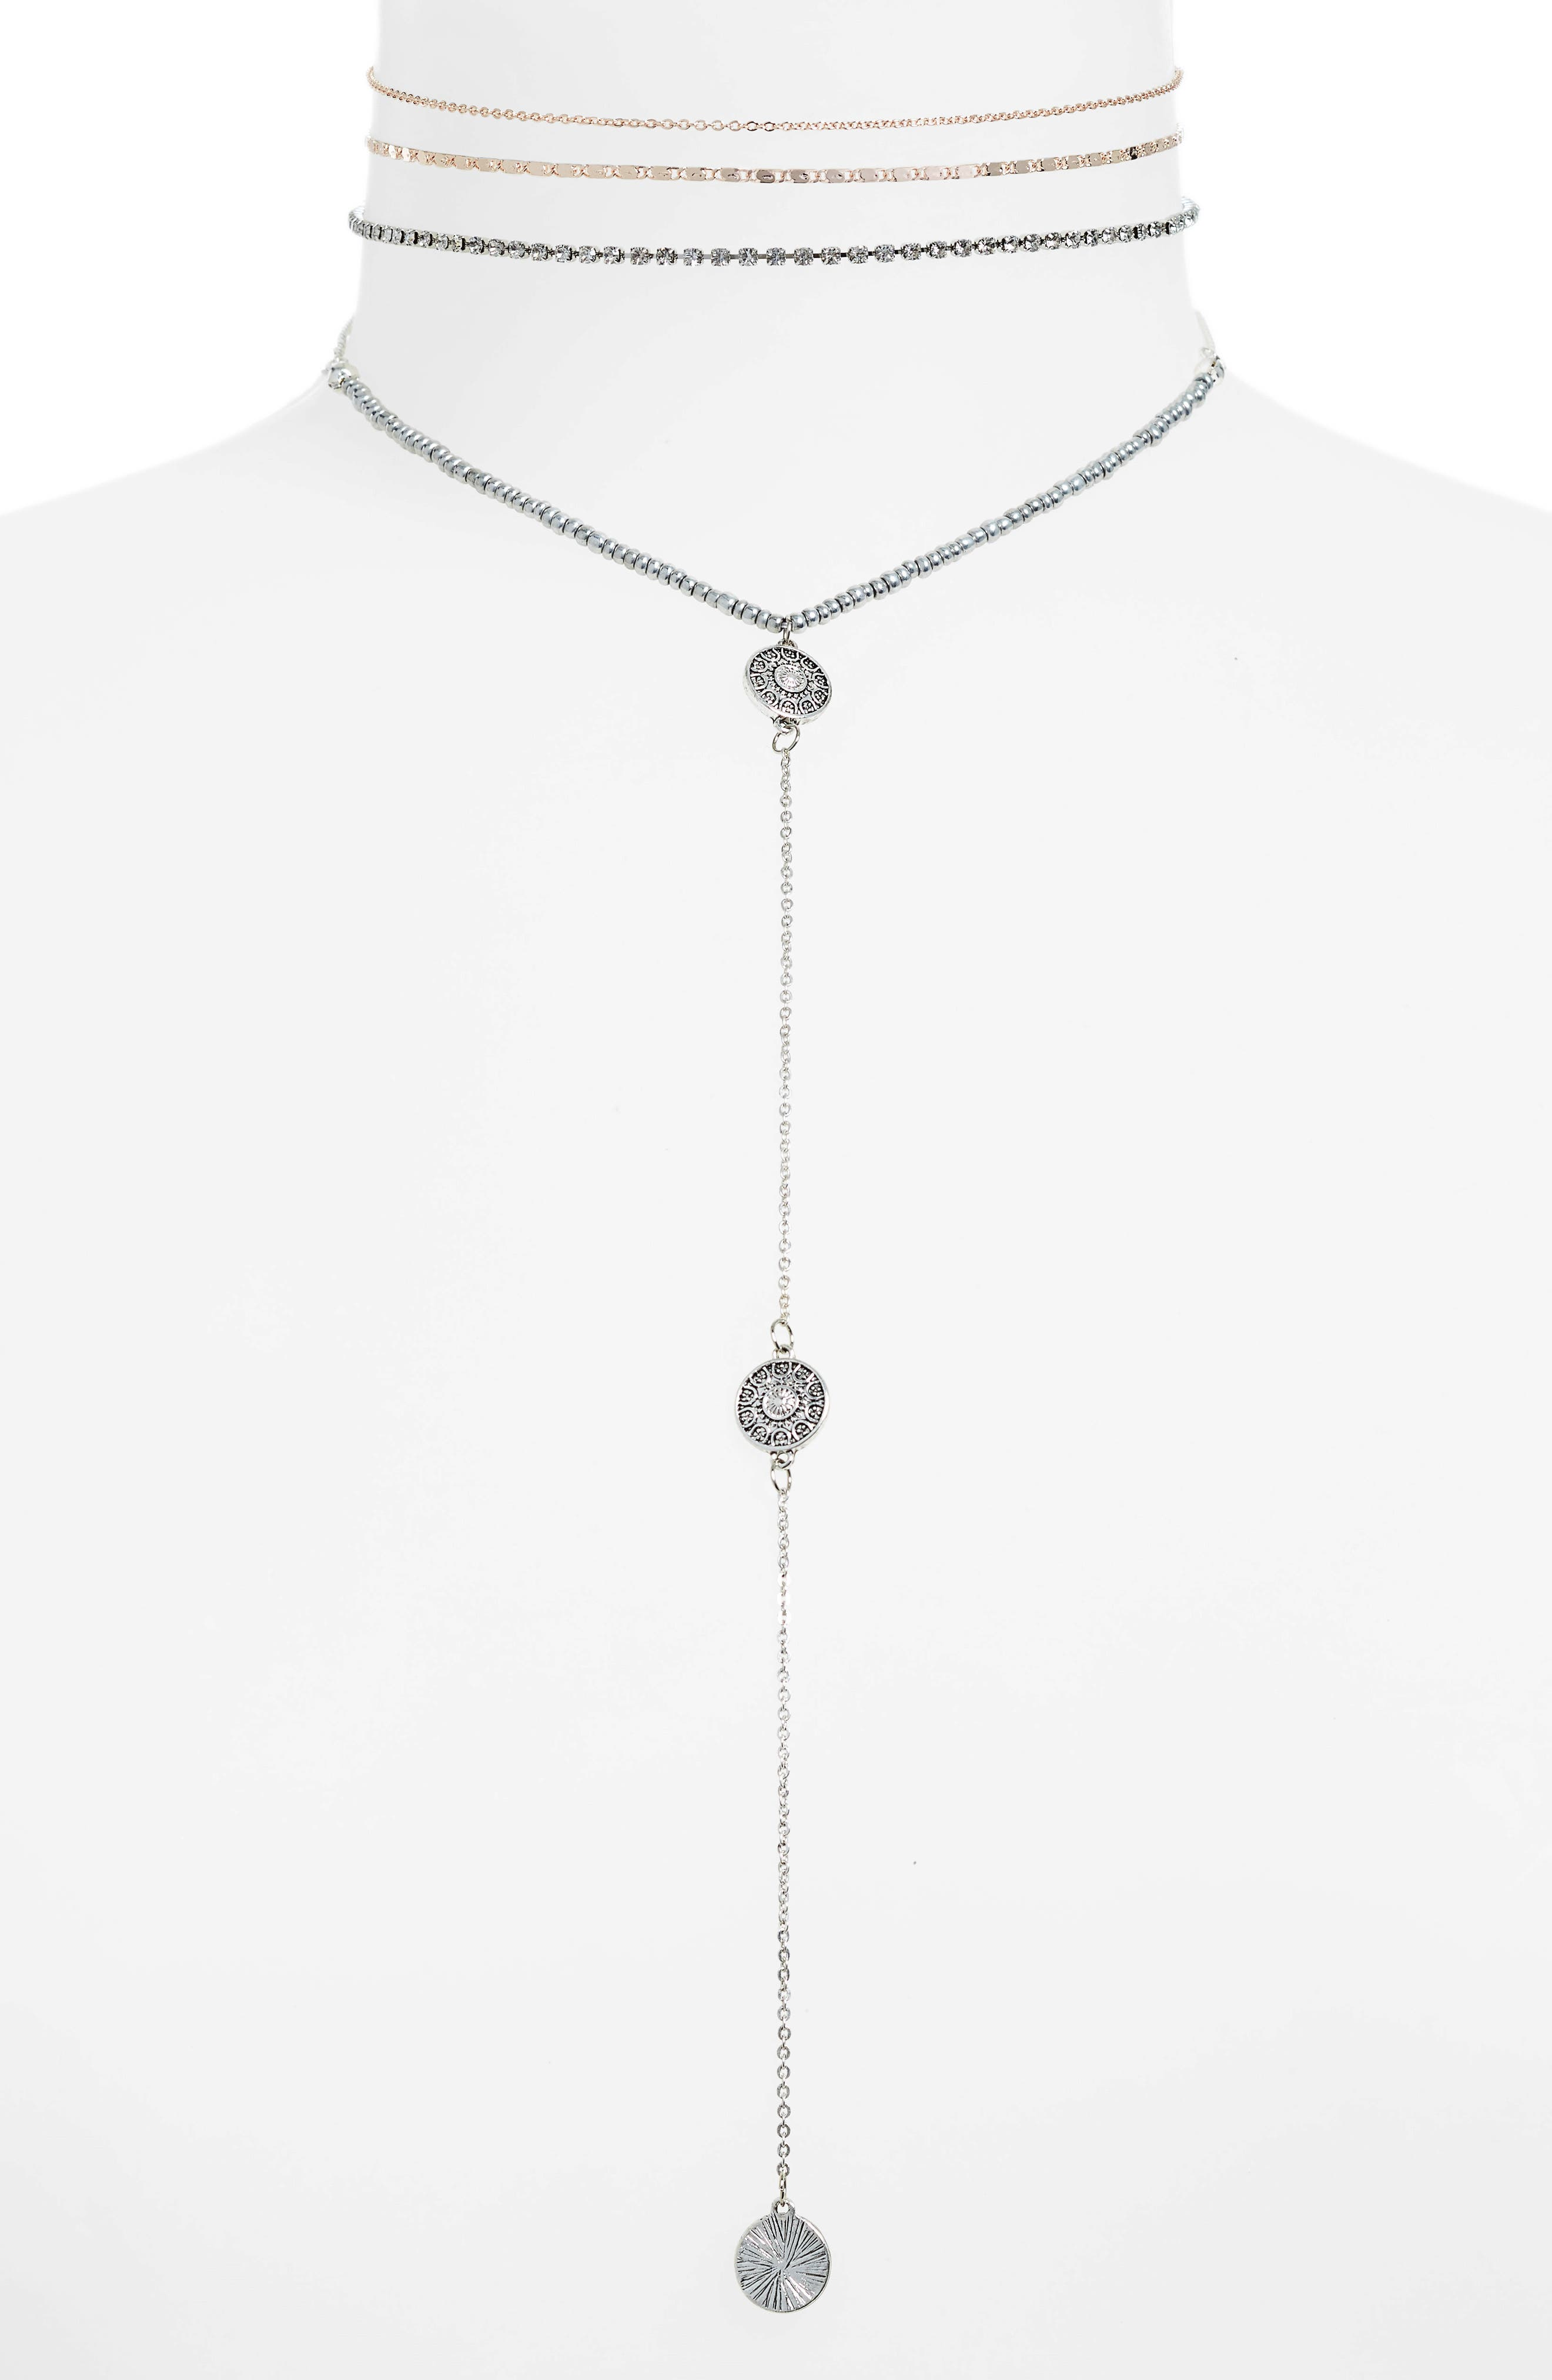 4-Pack Choker Necklaces,                             Main thumbnail 1, color,                             440